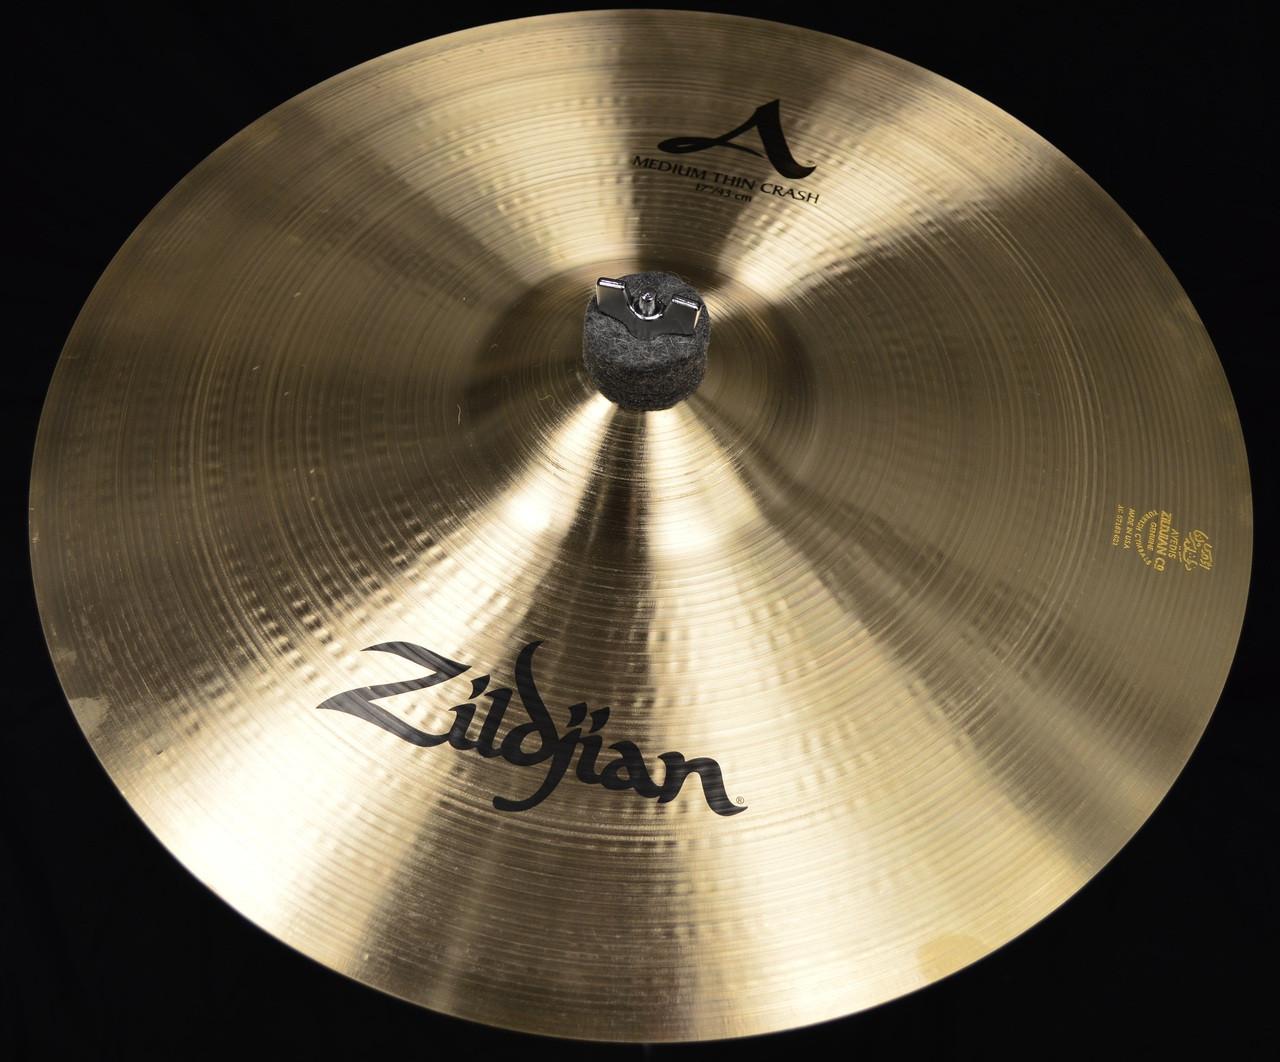 zildjian a series medium thin crash cymbal 17. Black Bedroom Furniture Sets. Home Design Ideas